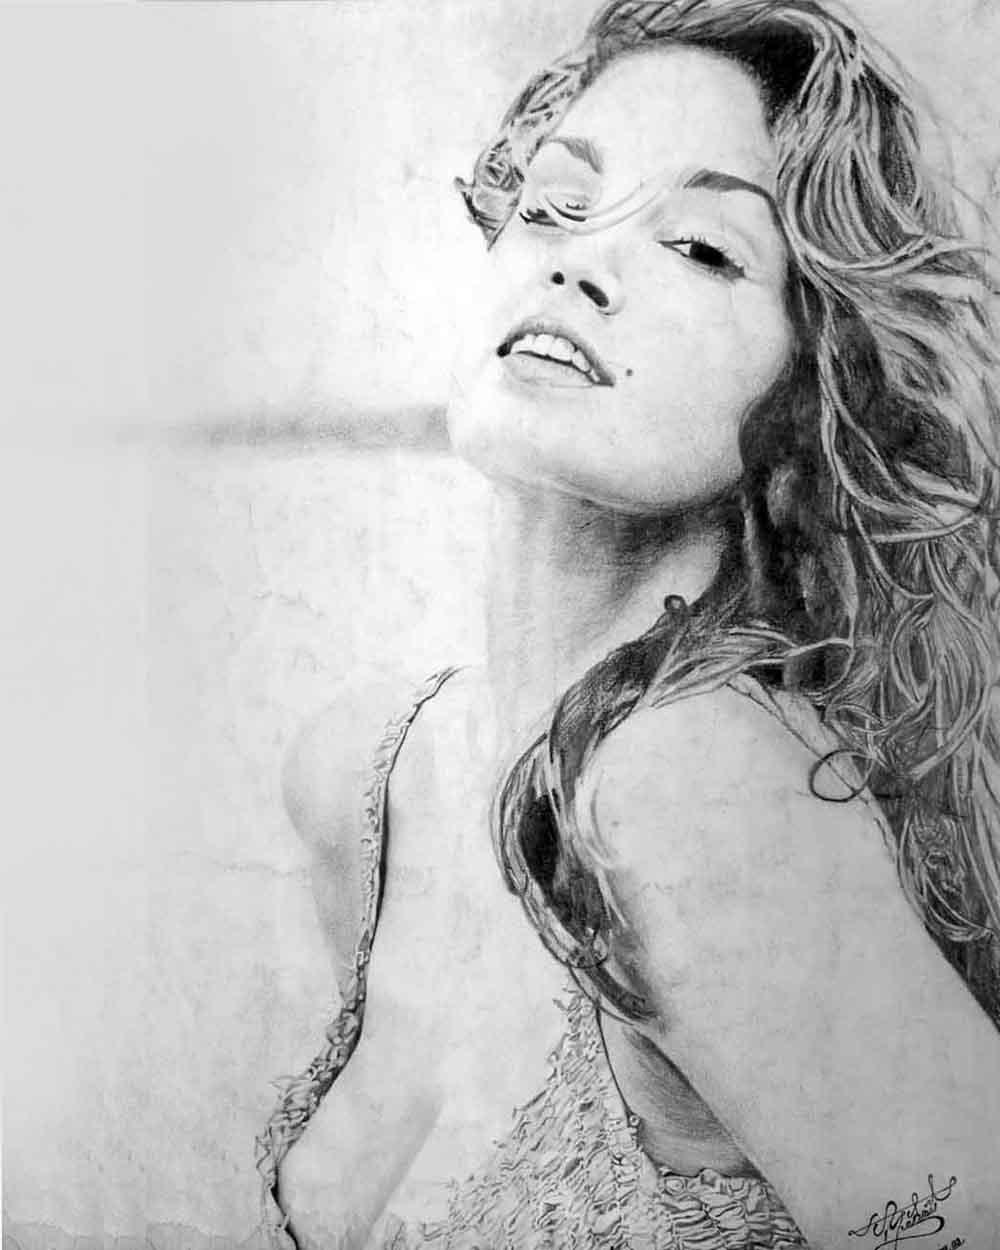 Cindy Crawford Kara Kalem Çizimi Diyarbakır